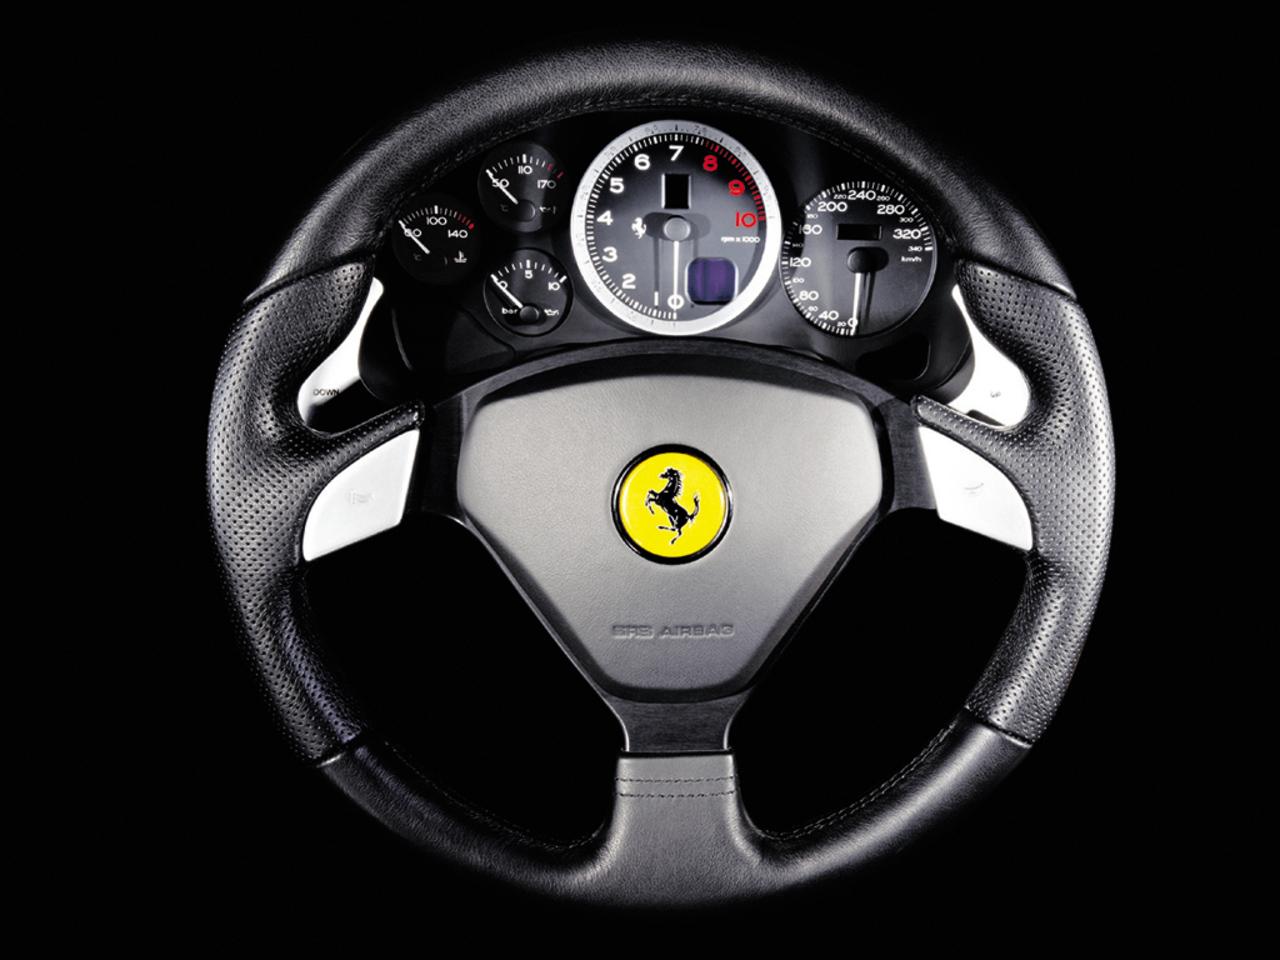 575M Maranello, steering wheel